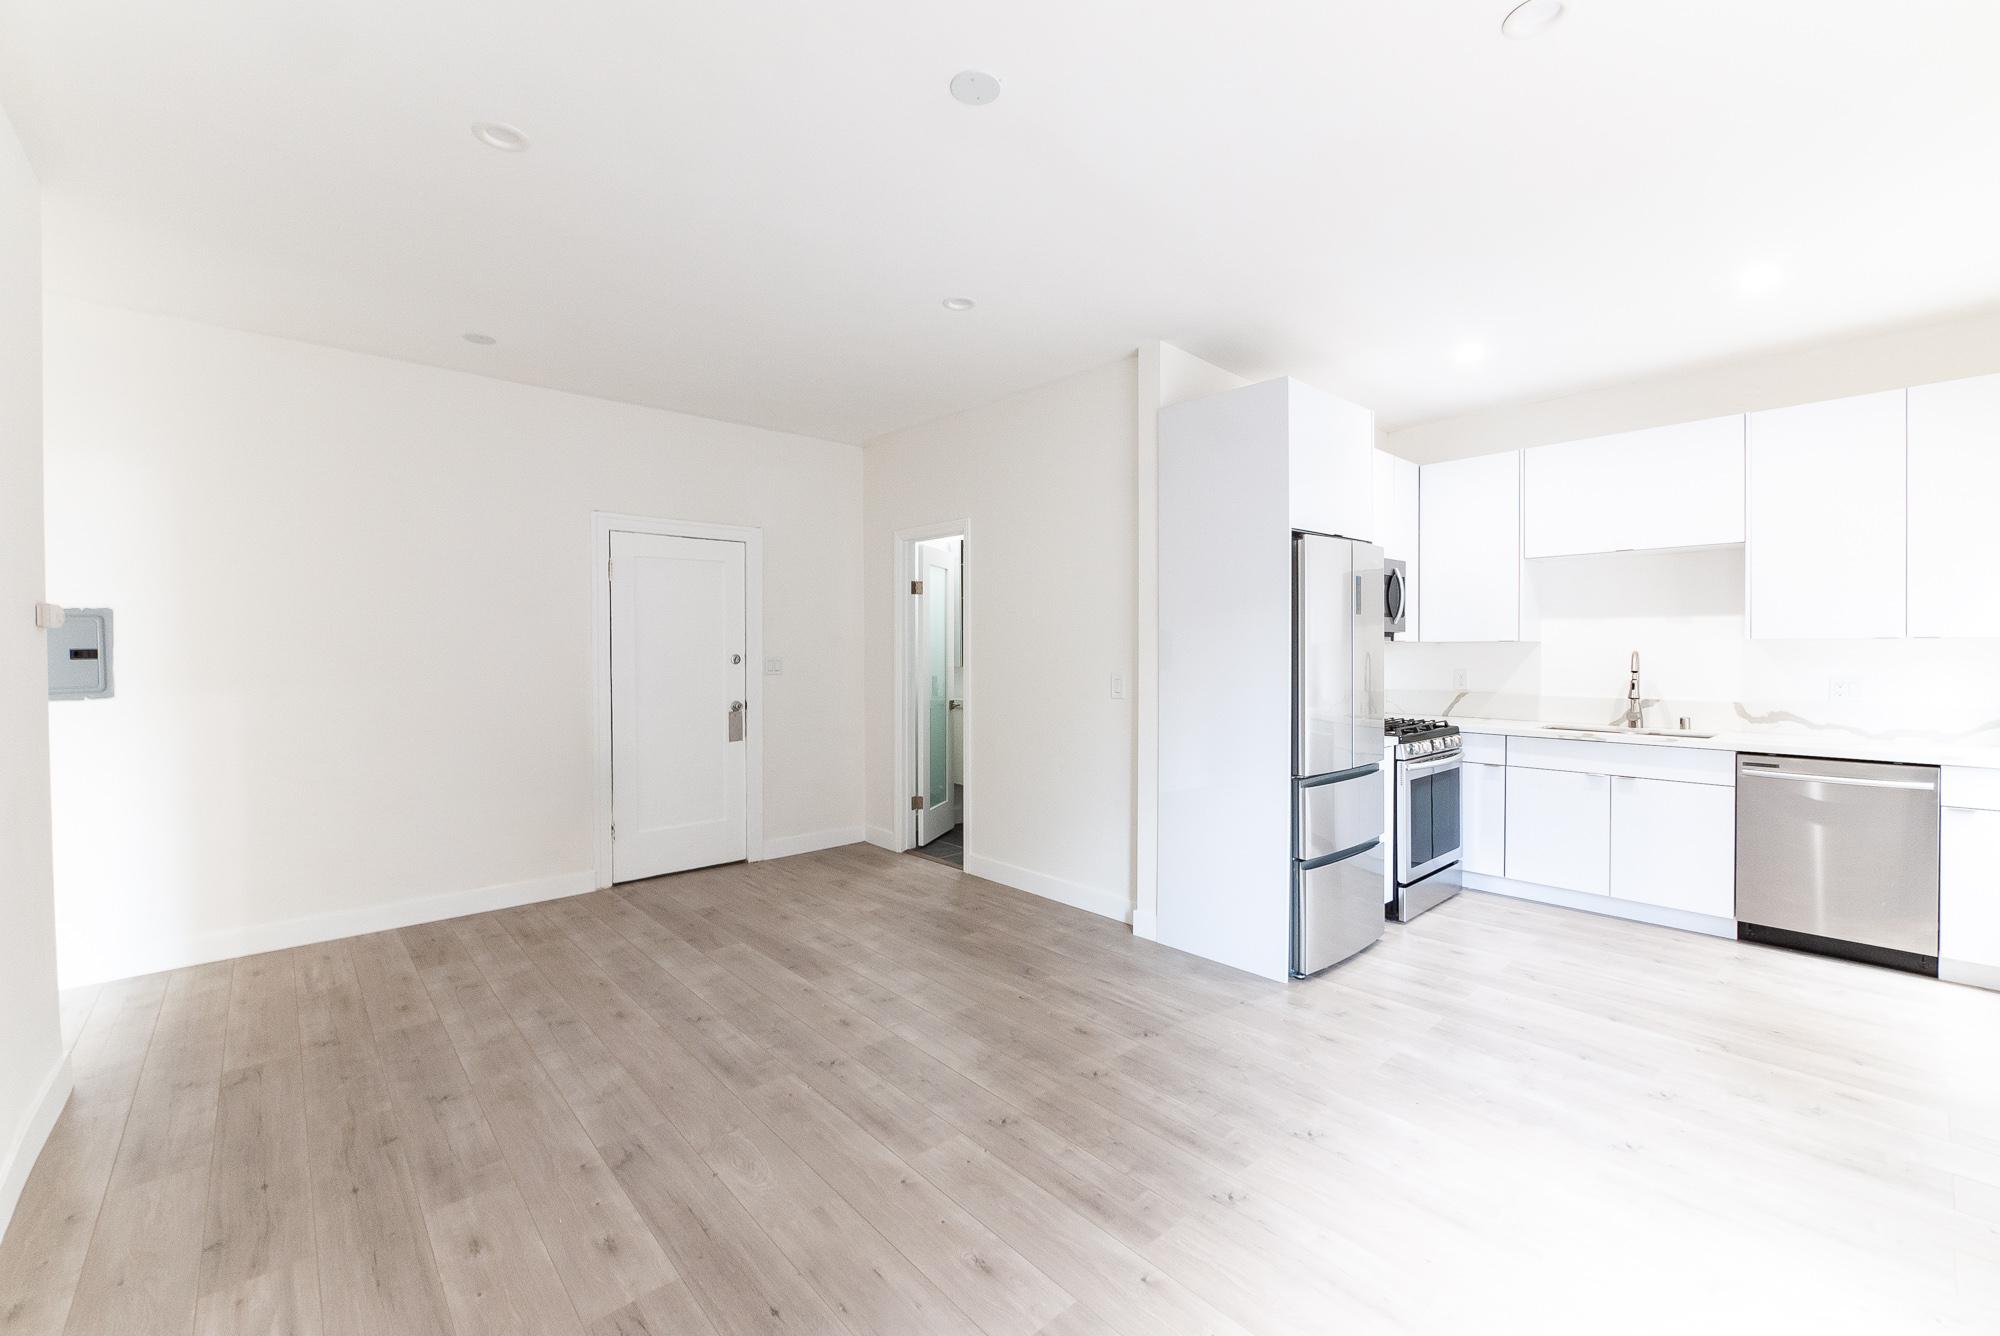 SUPER Lux! Brand New Reno 1B- INSTA worthy Kitchen- Move-In Special!